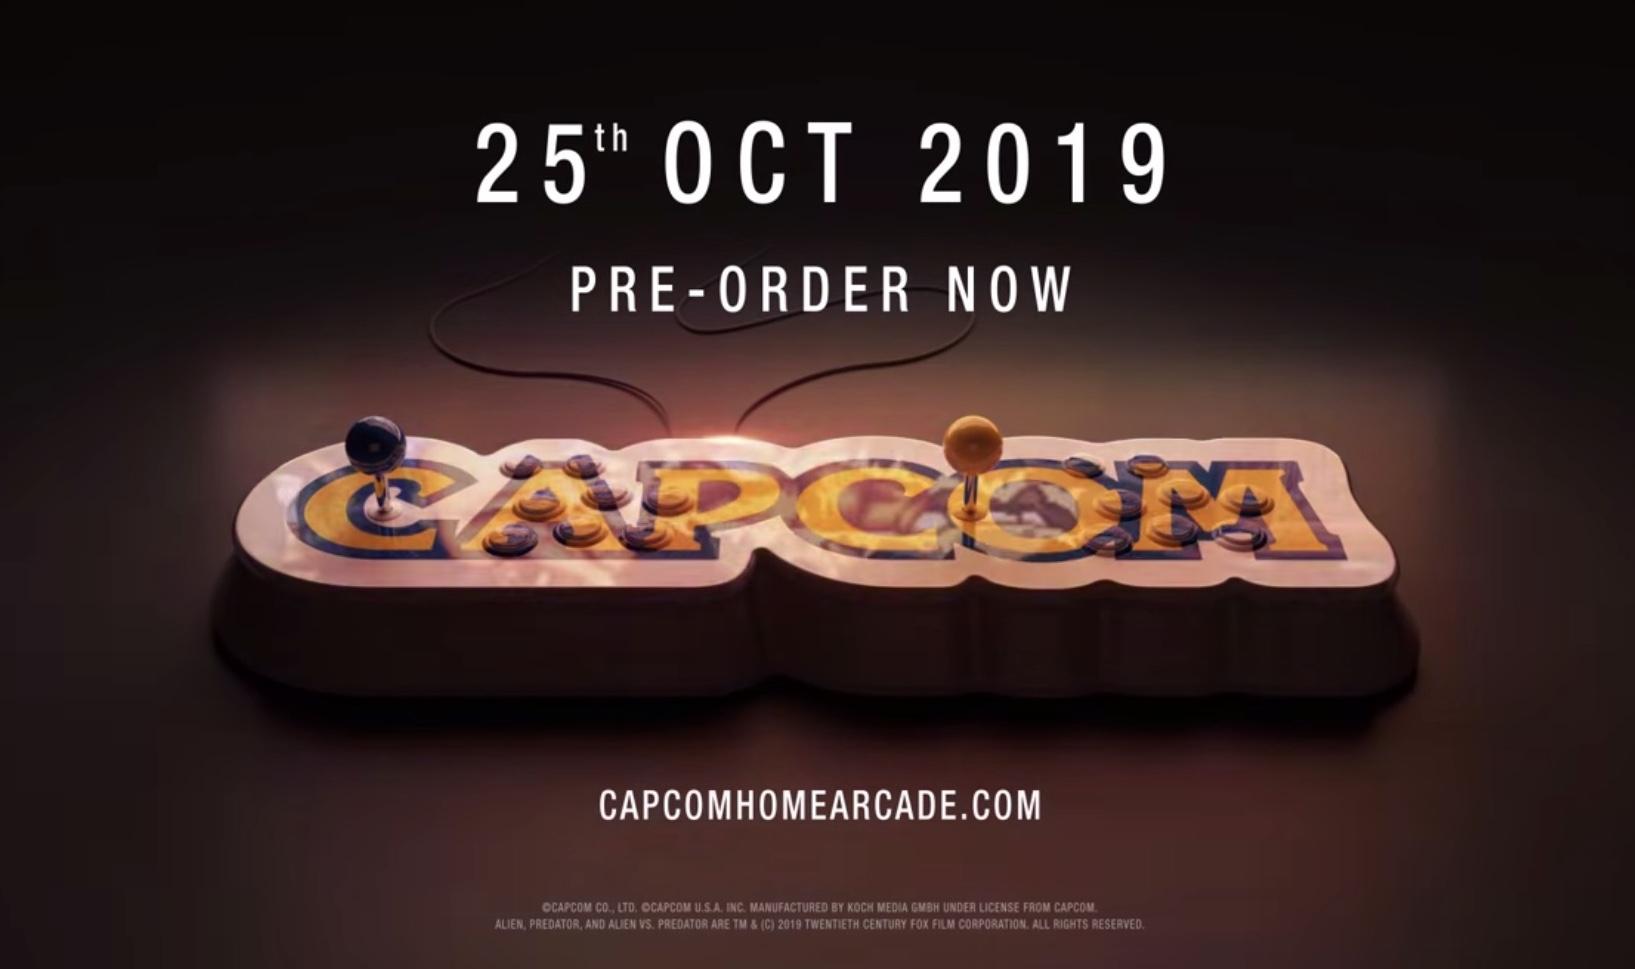 CAPCOMアーケードタイトルが詰まったコンソール発表。『エイリアンVSプレデター』も収録!